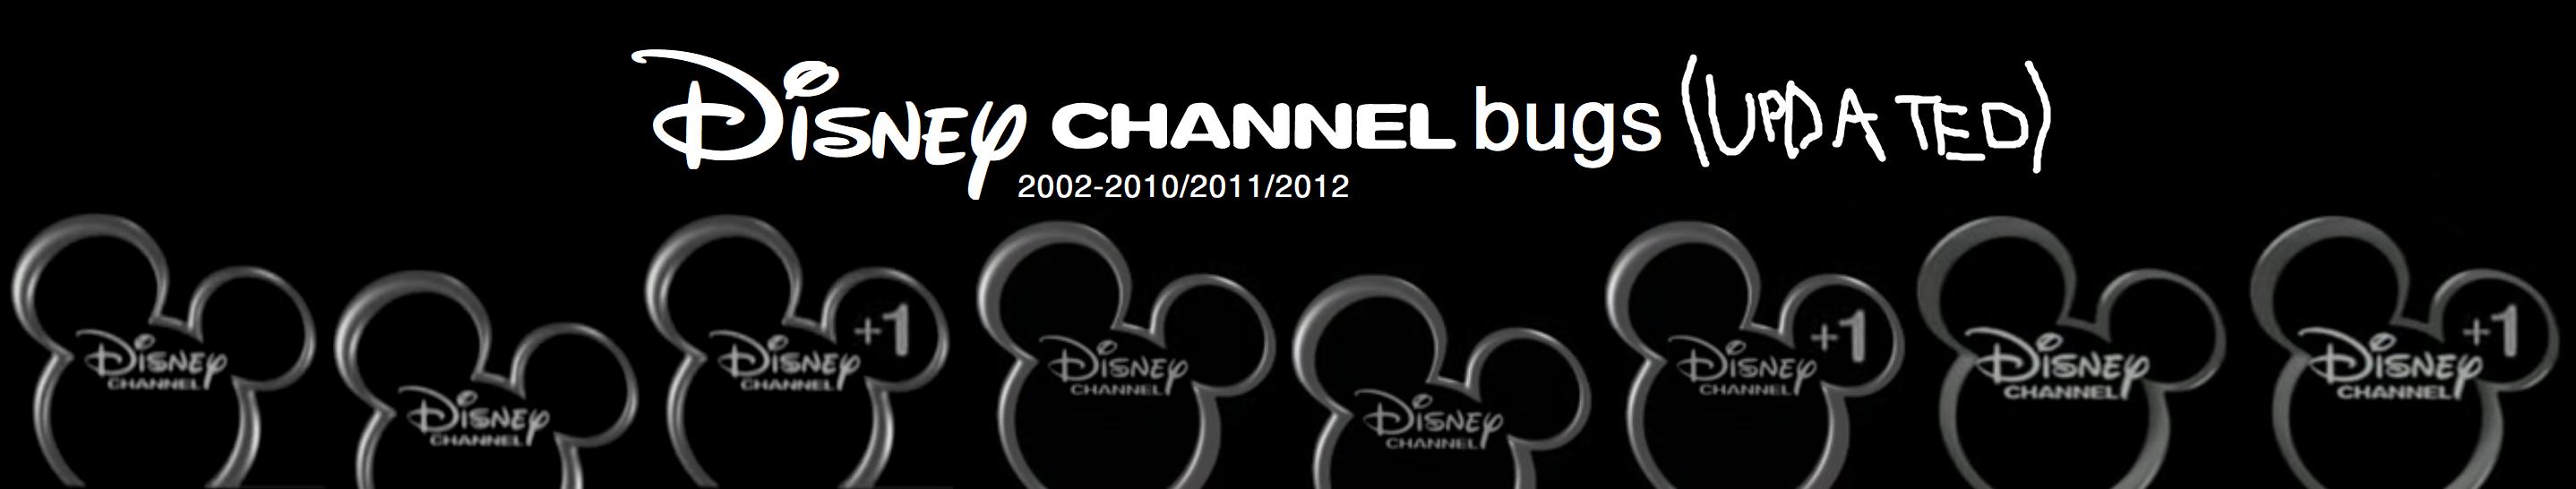 Disney Channel Logo Abc Screen Bug Wwwimagessurecom